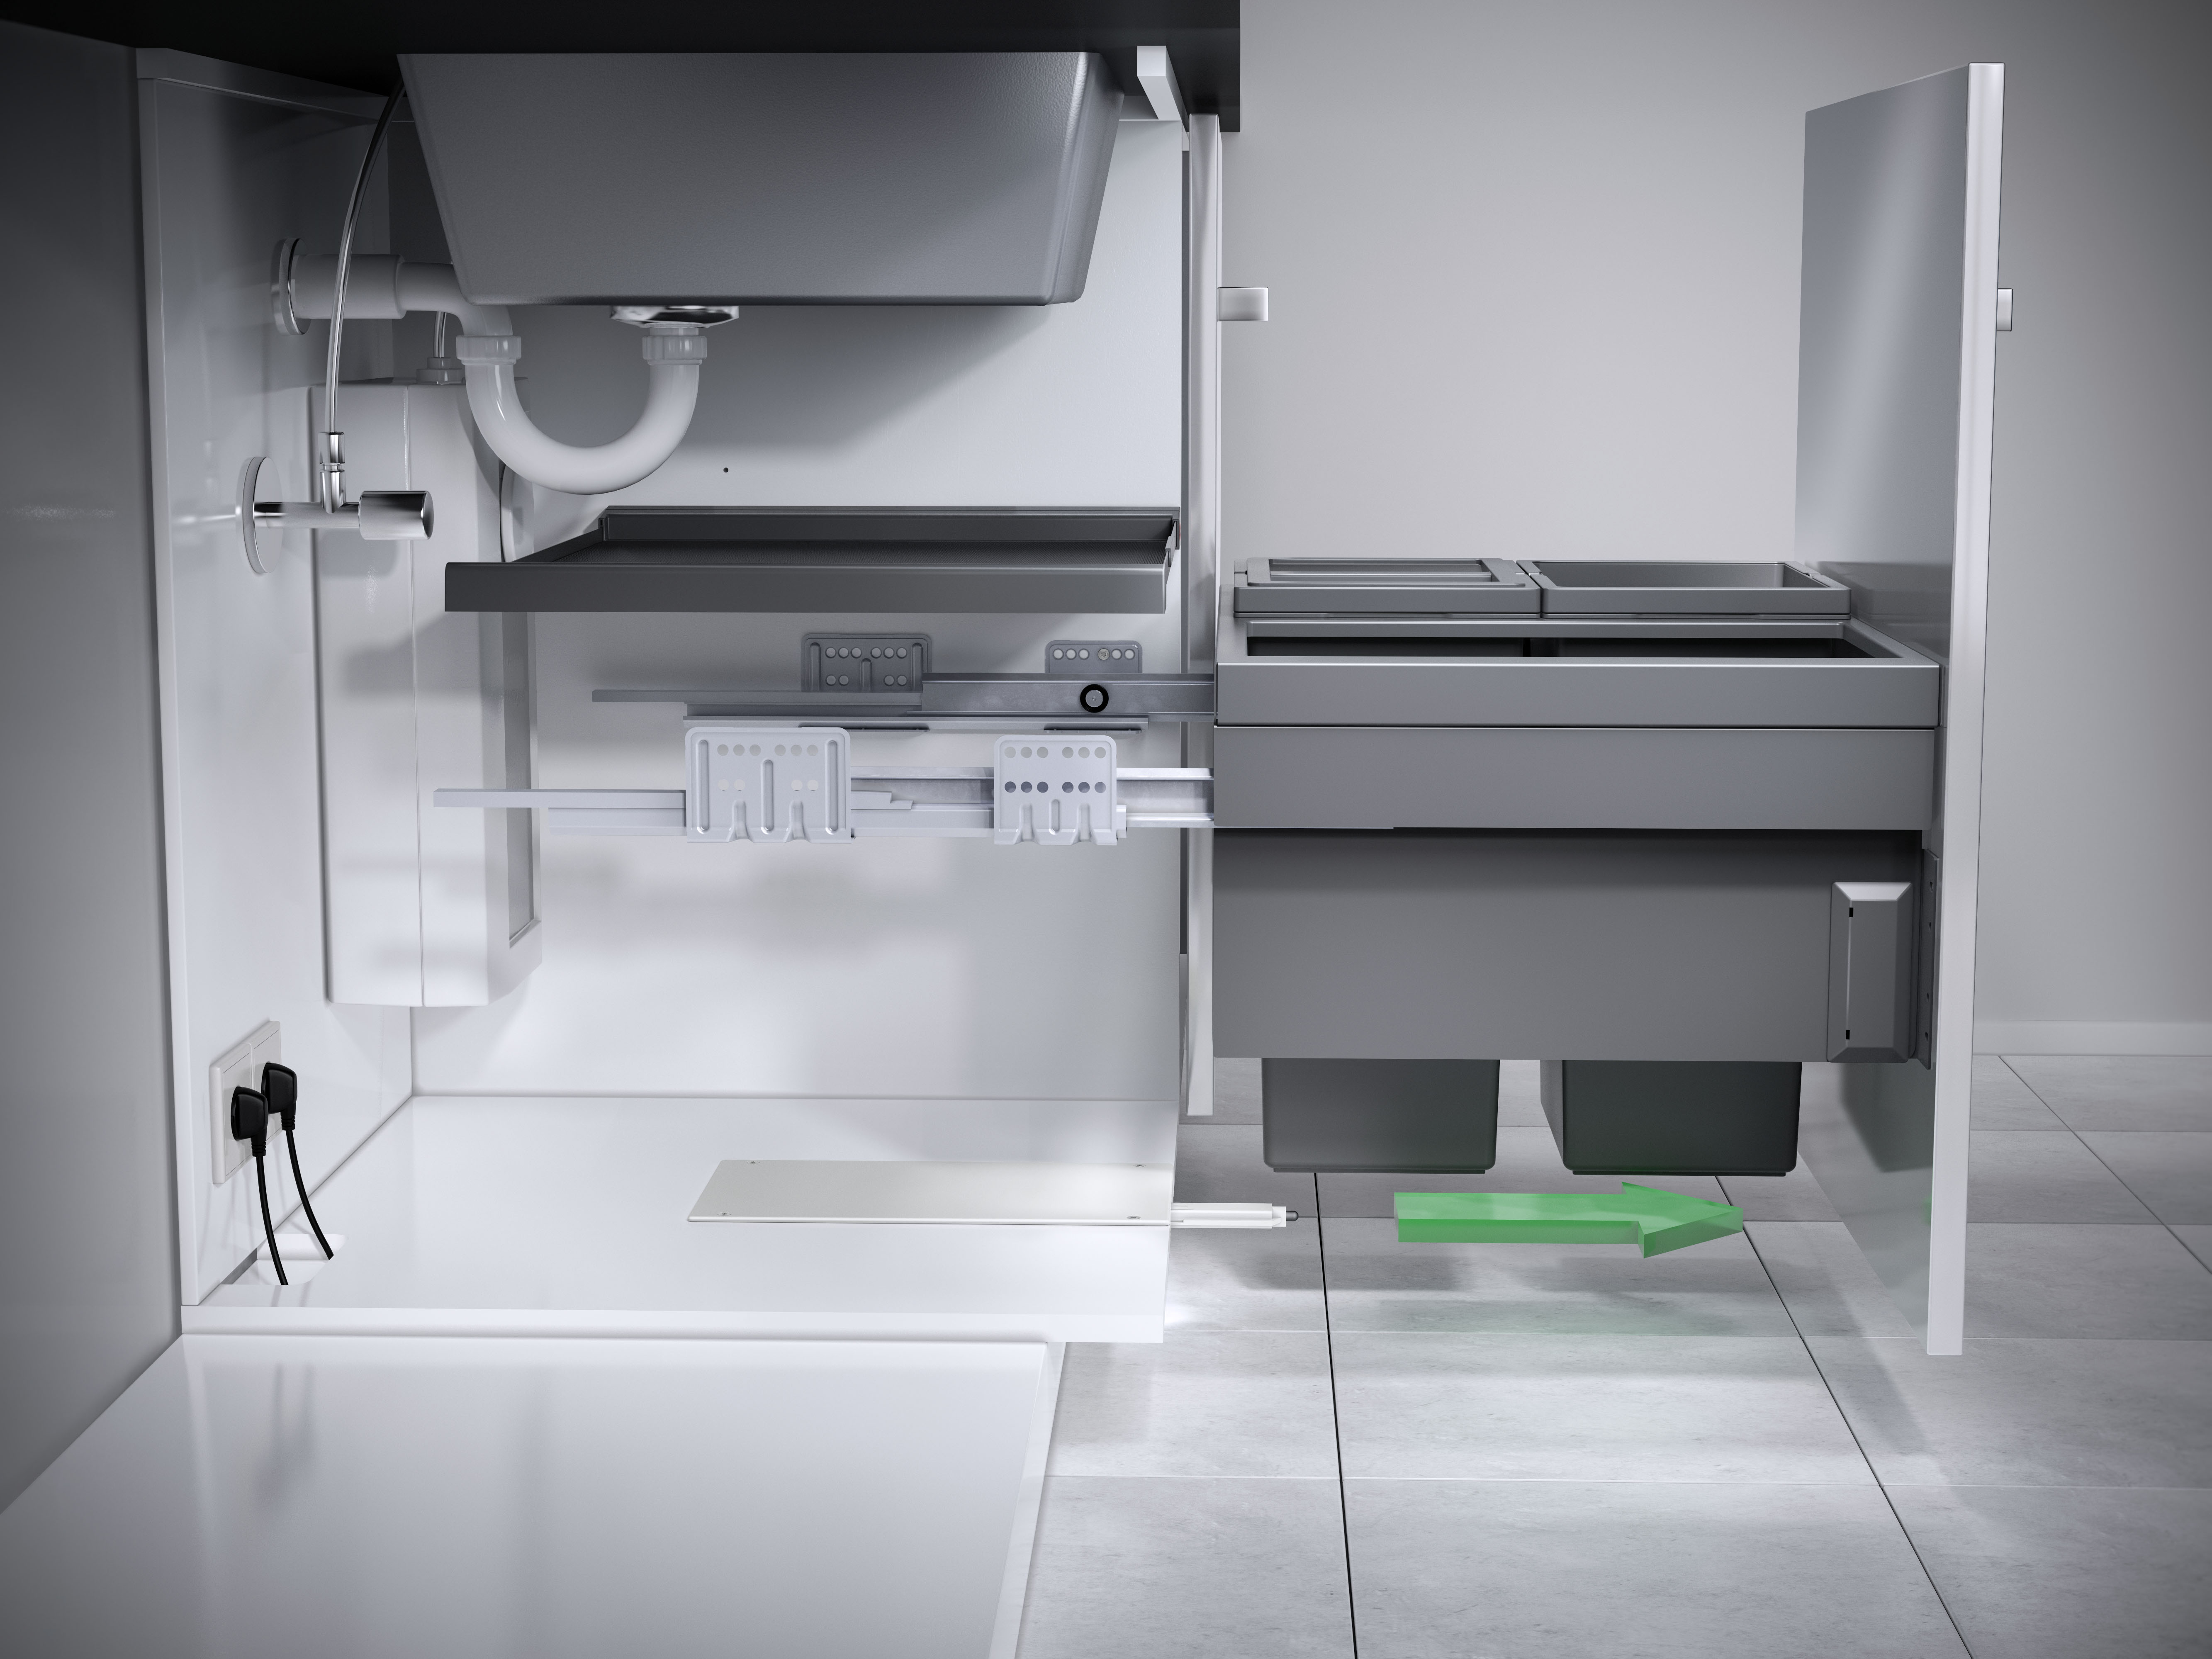 Smart Home: Hailo macht den Küchenschrank smarter | UMAXO